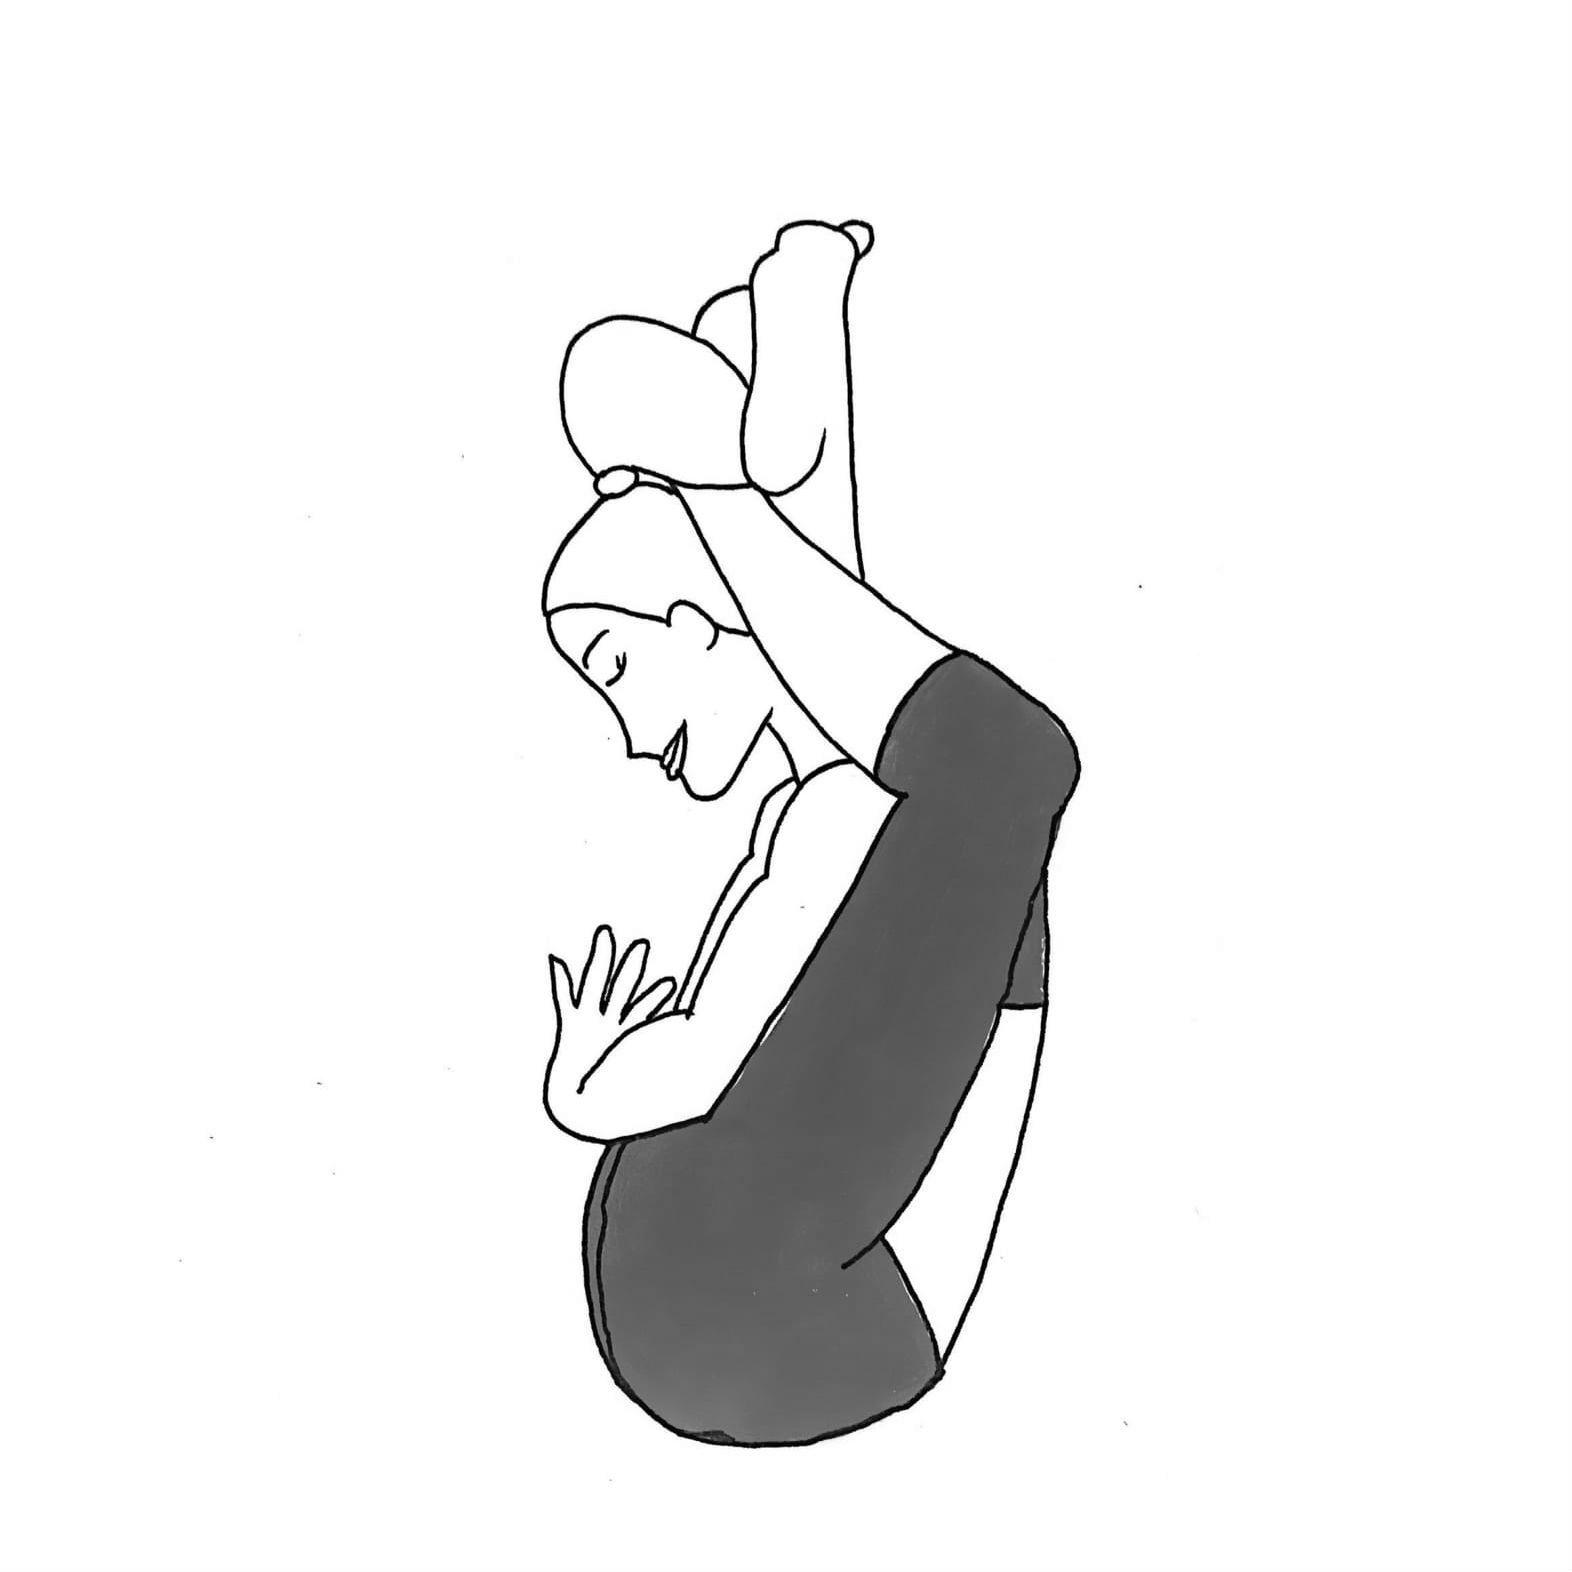 Two Feet To Head Pose A - Dwi Pada Sirsasana A